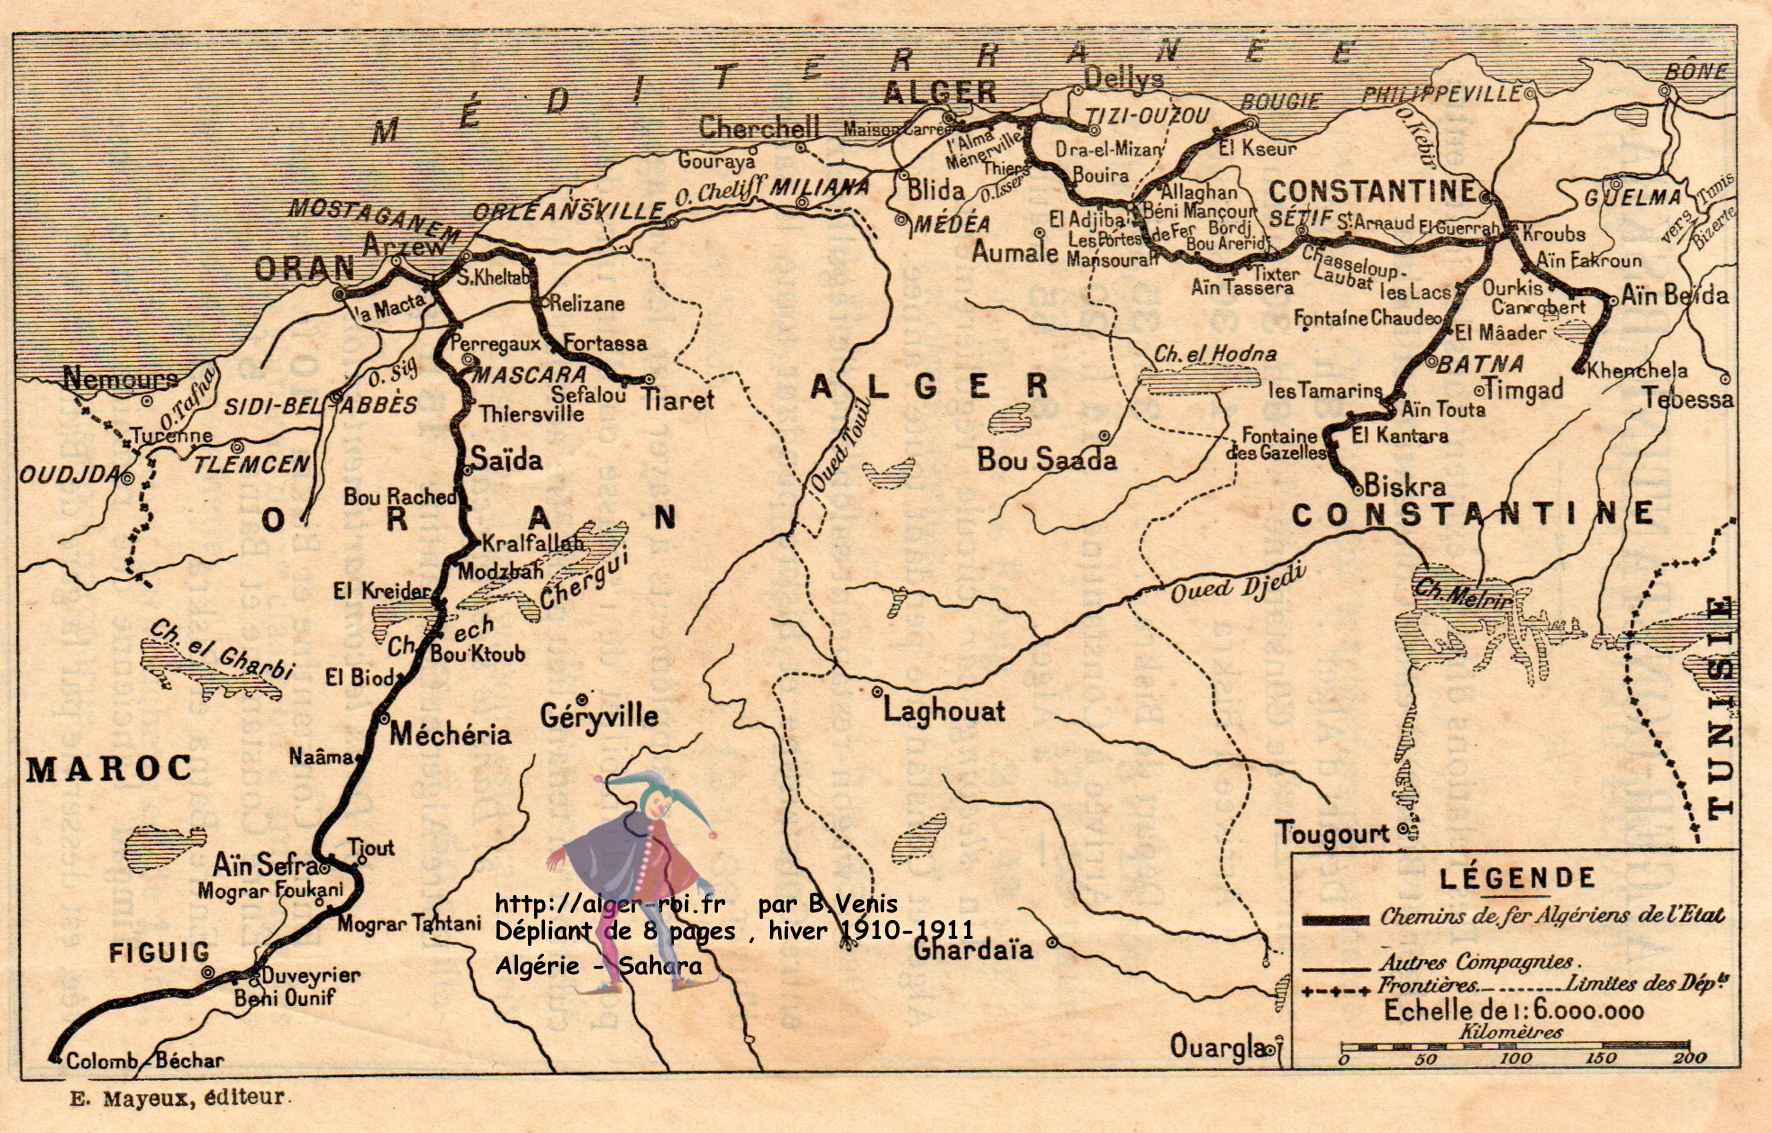 carte chemin de fer Carte des chemins de fer d'Algérie, algerie,sahara,alger, kabylie